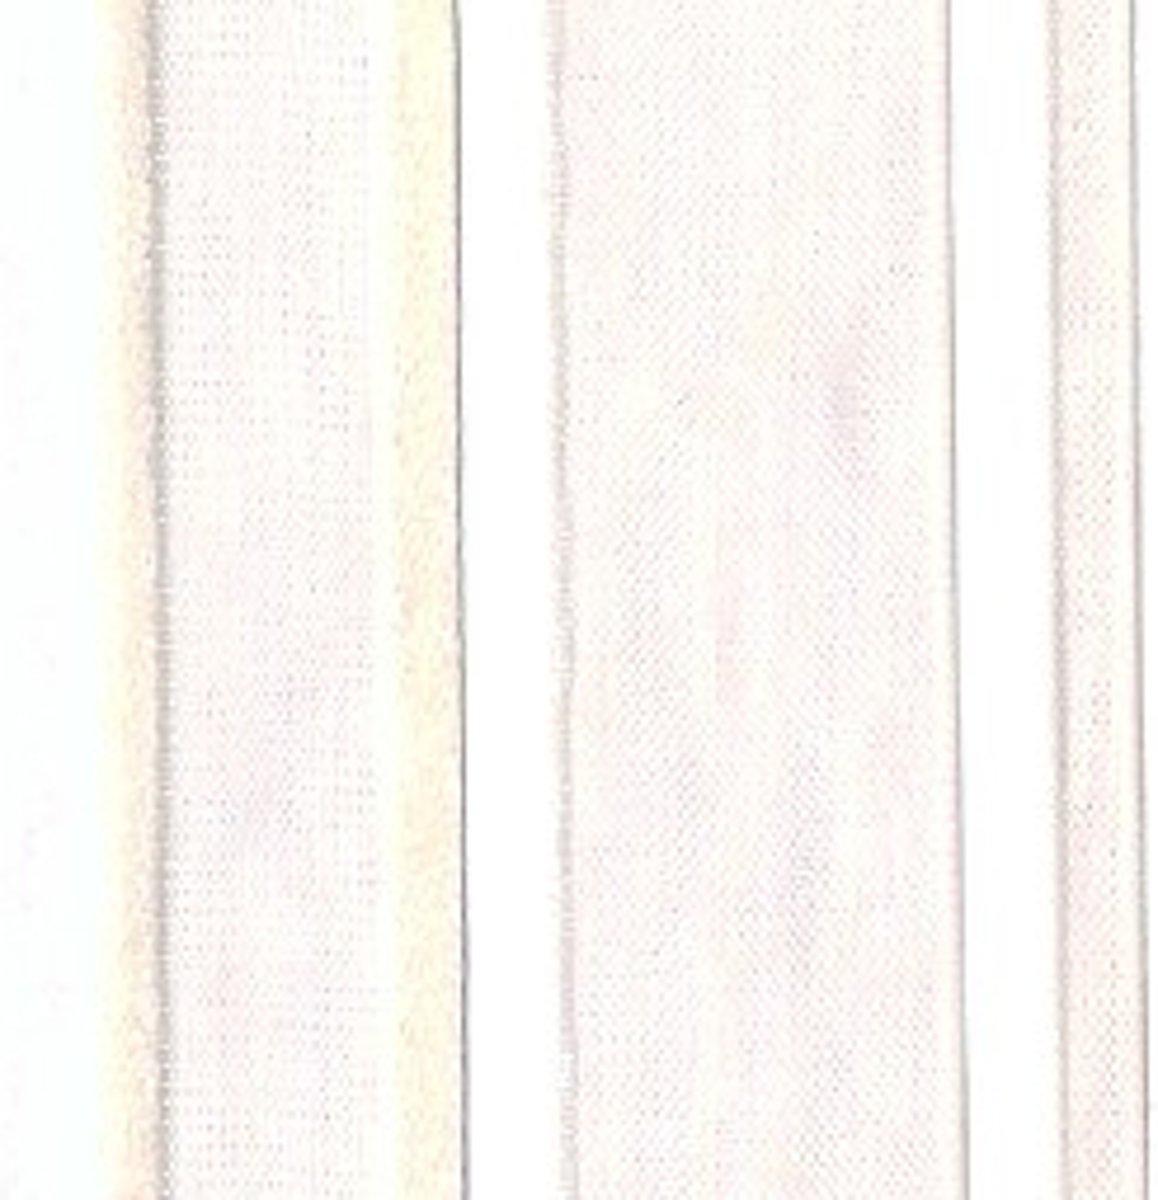 Ivoor Satin Edge Satin Edge Lint 1.5cmx23 meter (1 Stuk) [RIBSEIVR] kopen